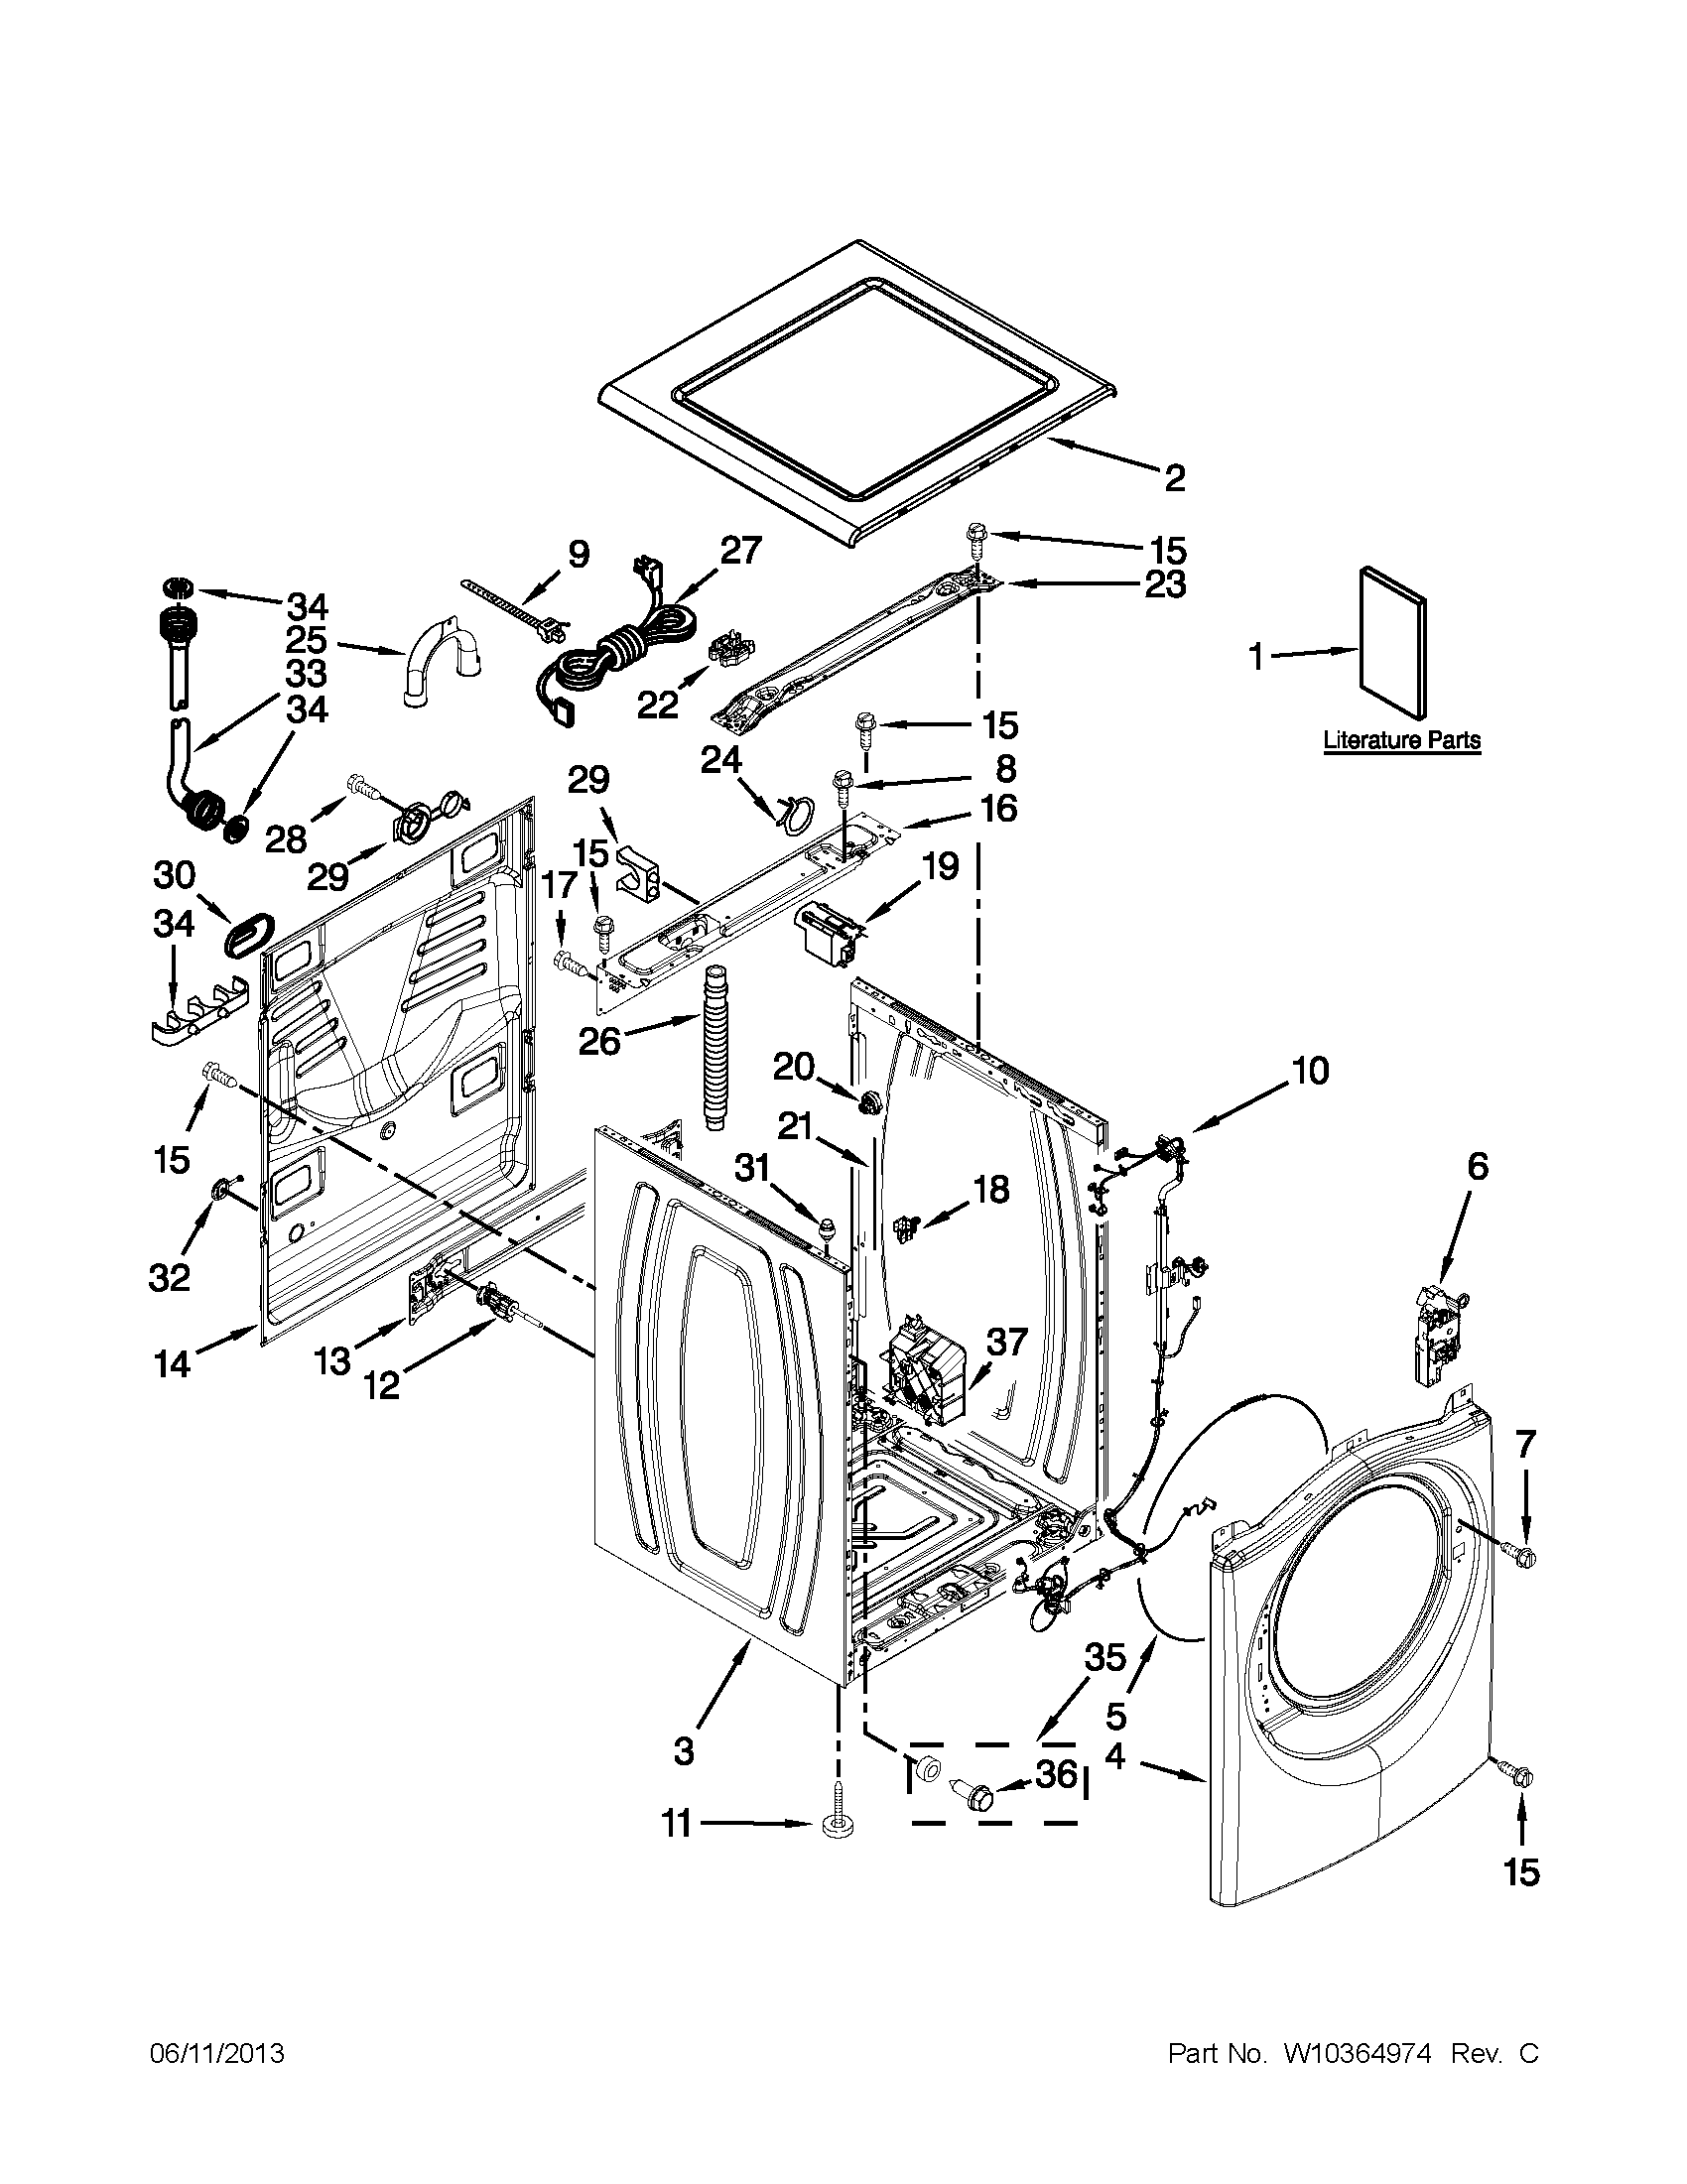 Error Code Message F06 And E01  Whirlpool Duet Washing Machine